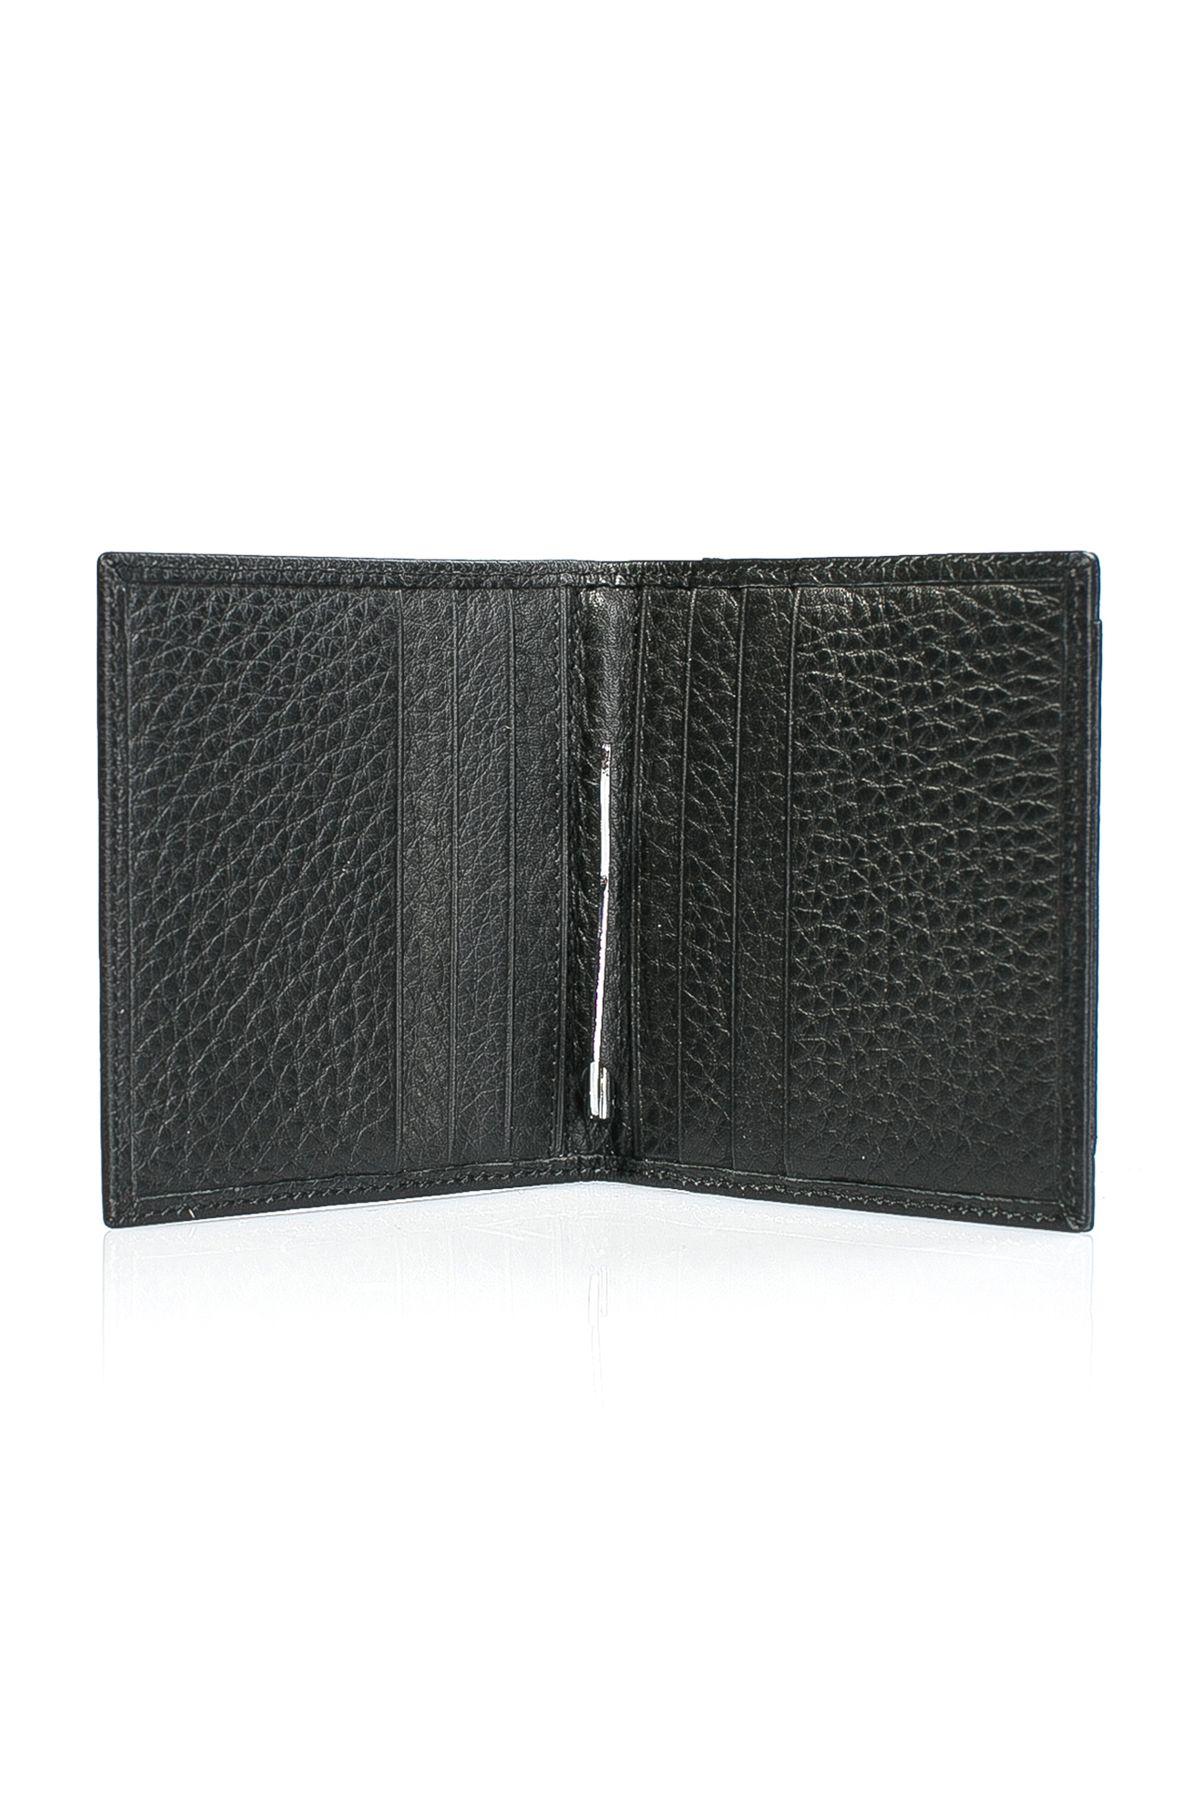 White Rabbit Pocket Leather Wallet Black